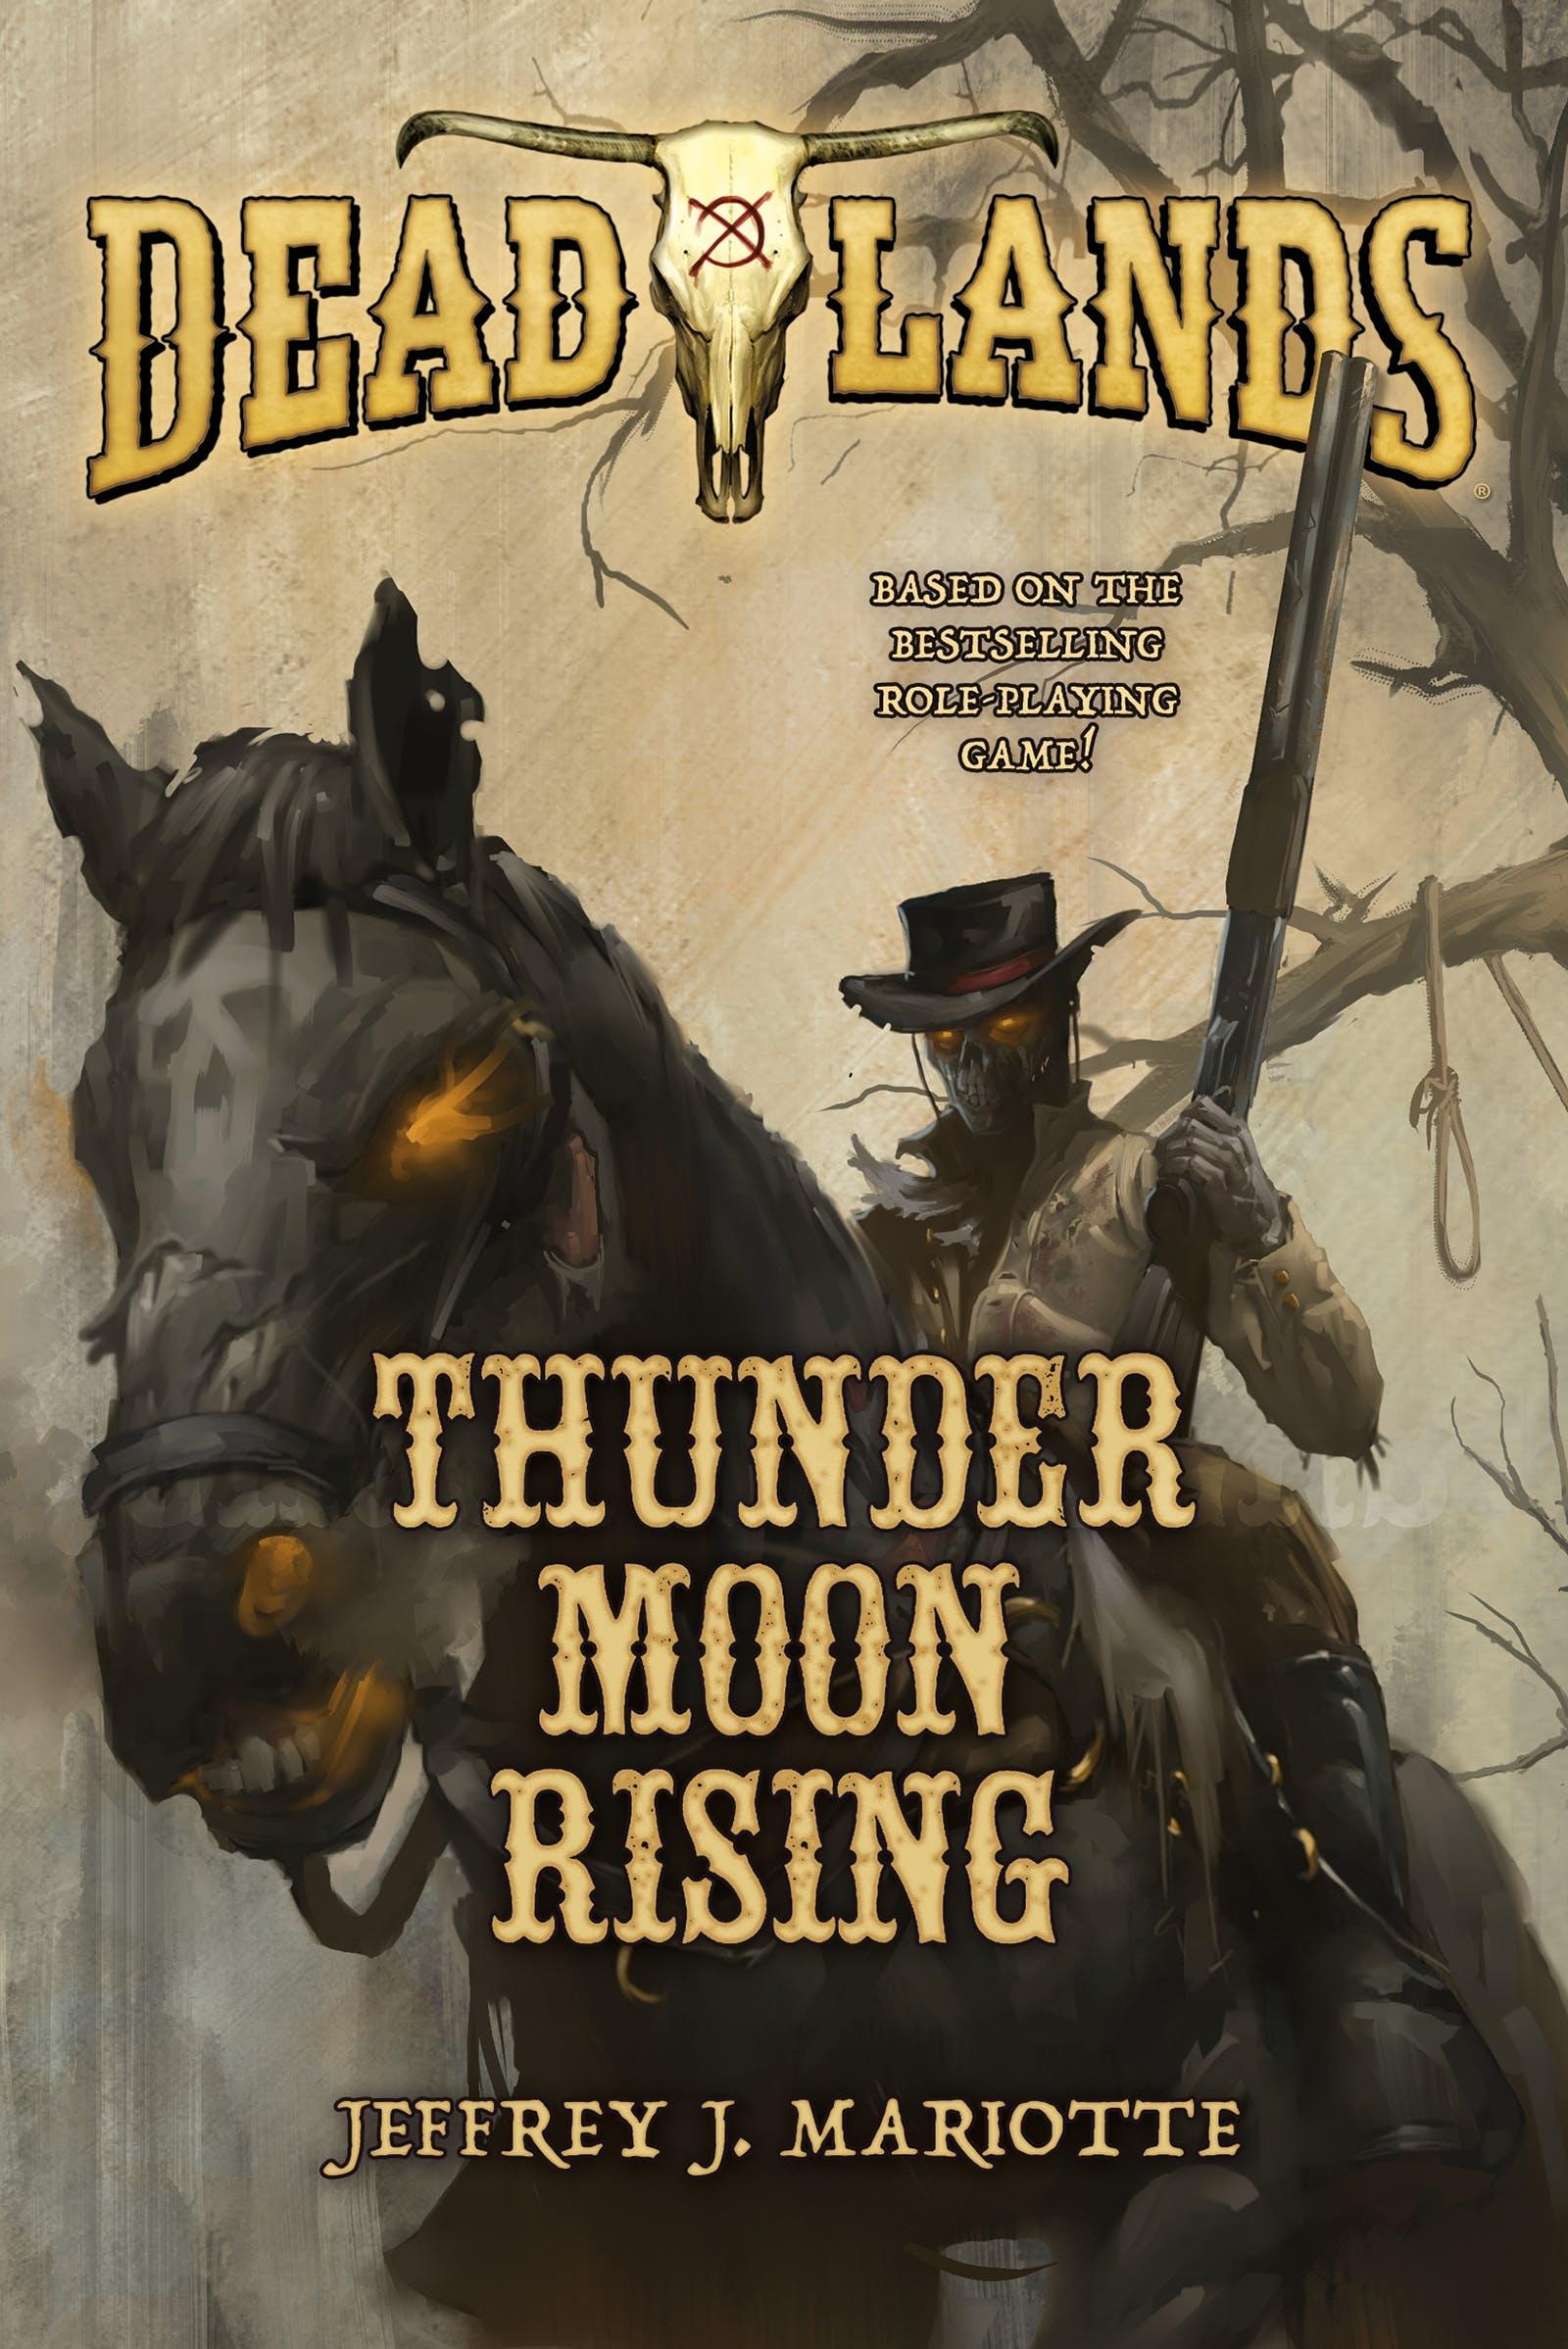 Image of Deadlands: Thunder Moon Rising